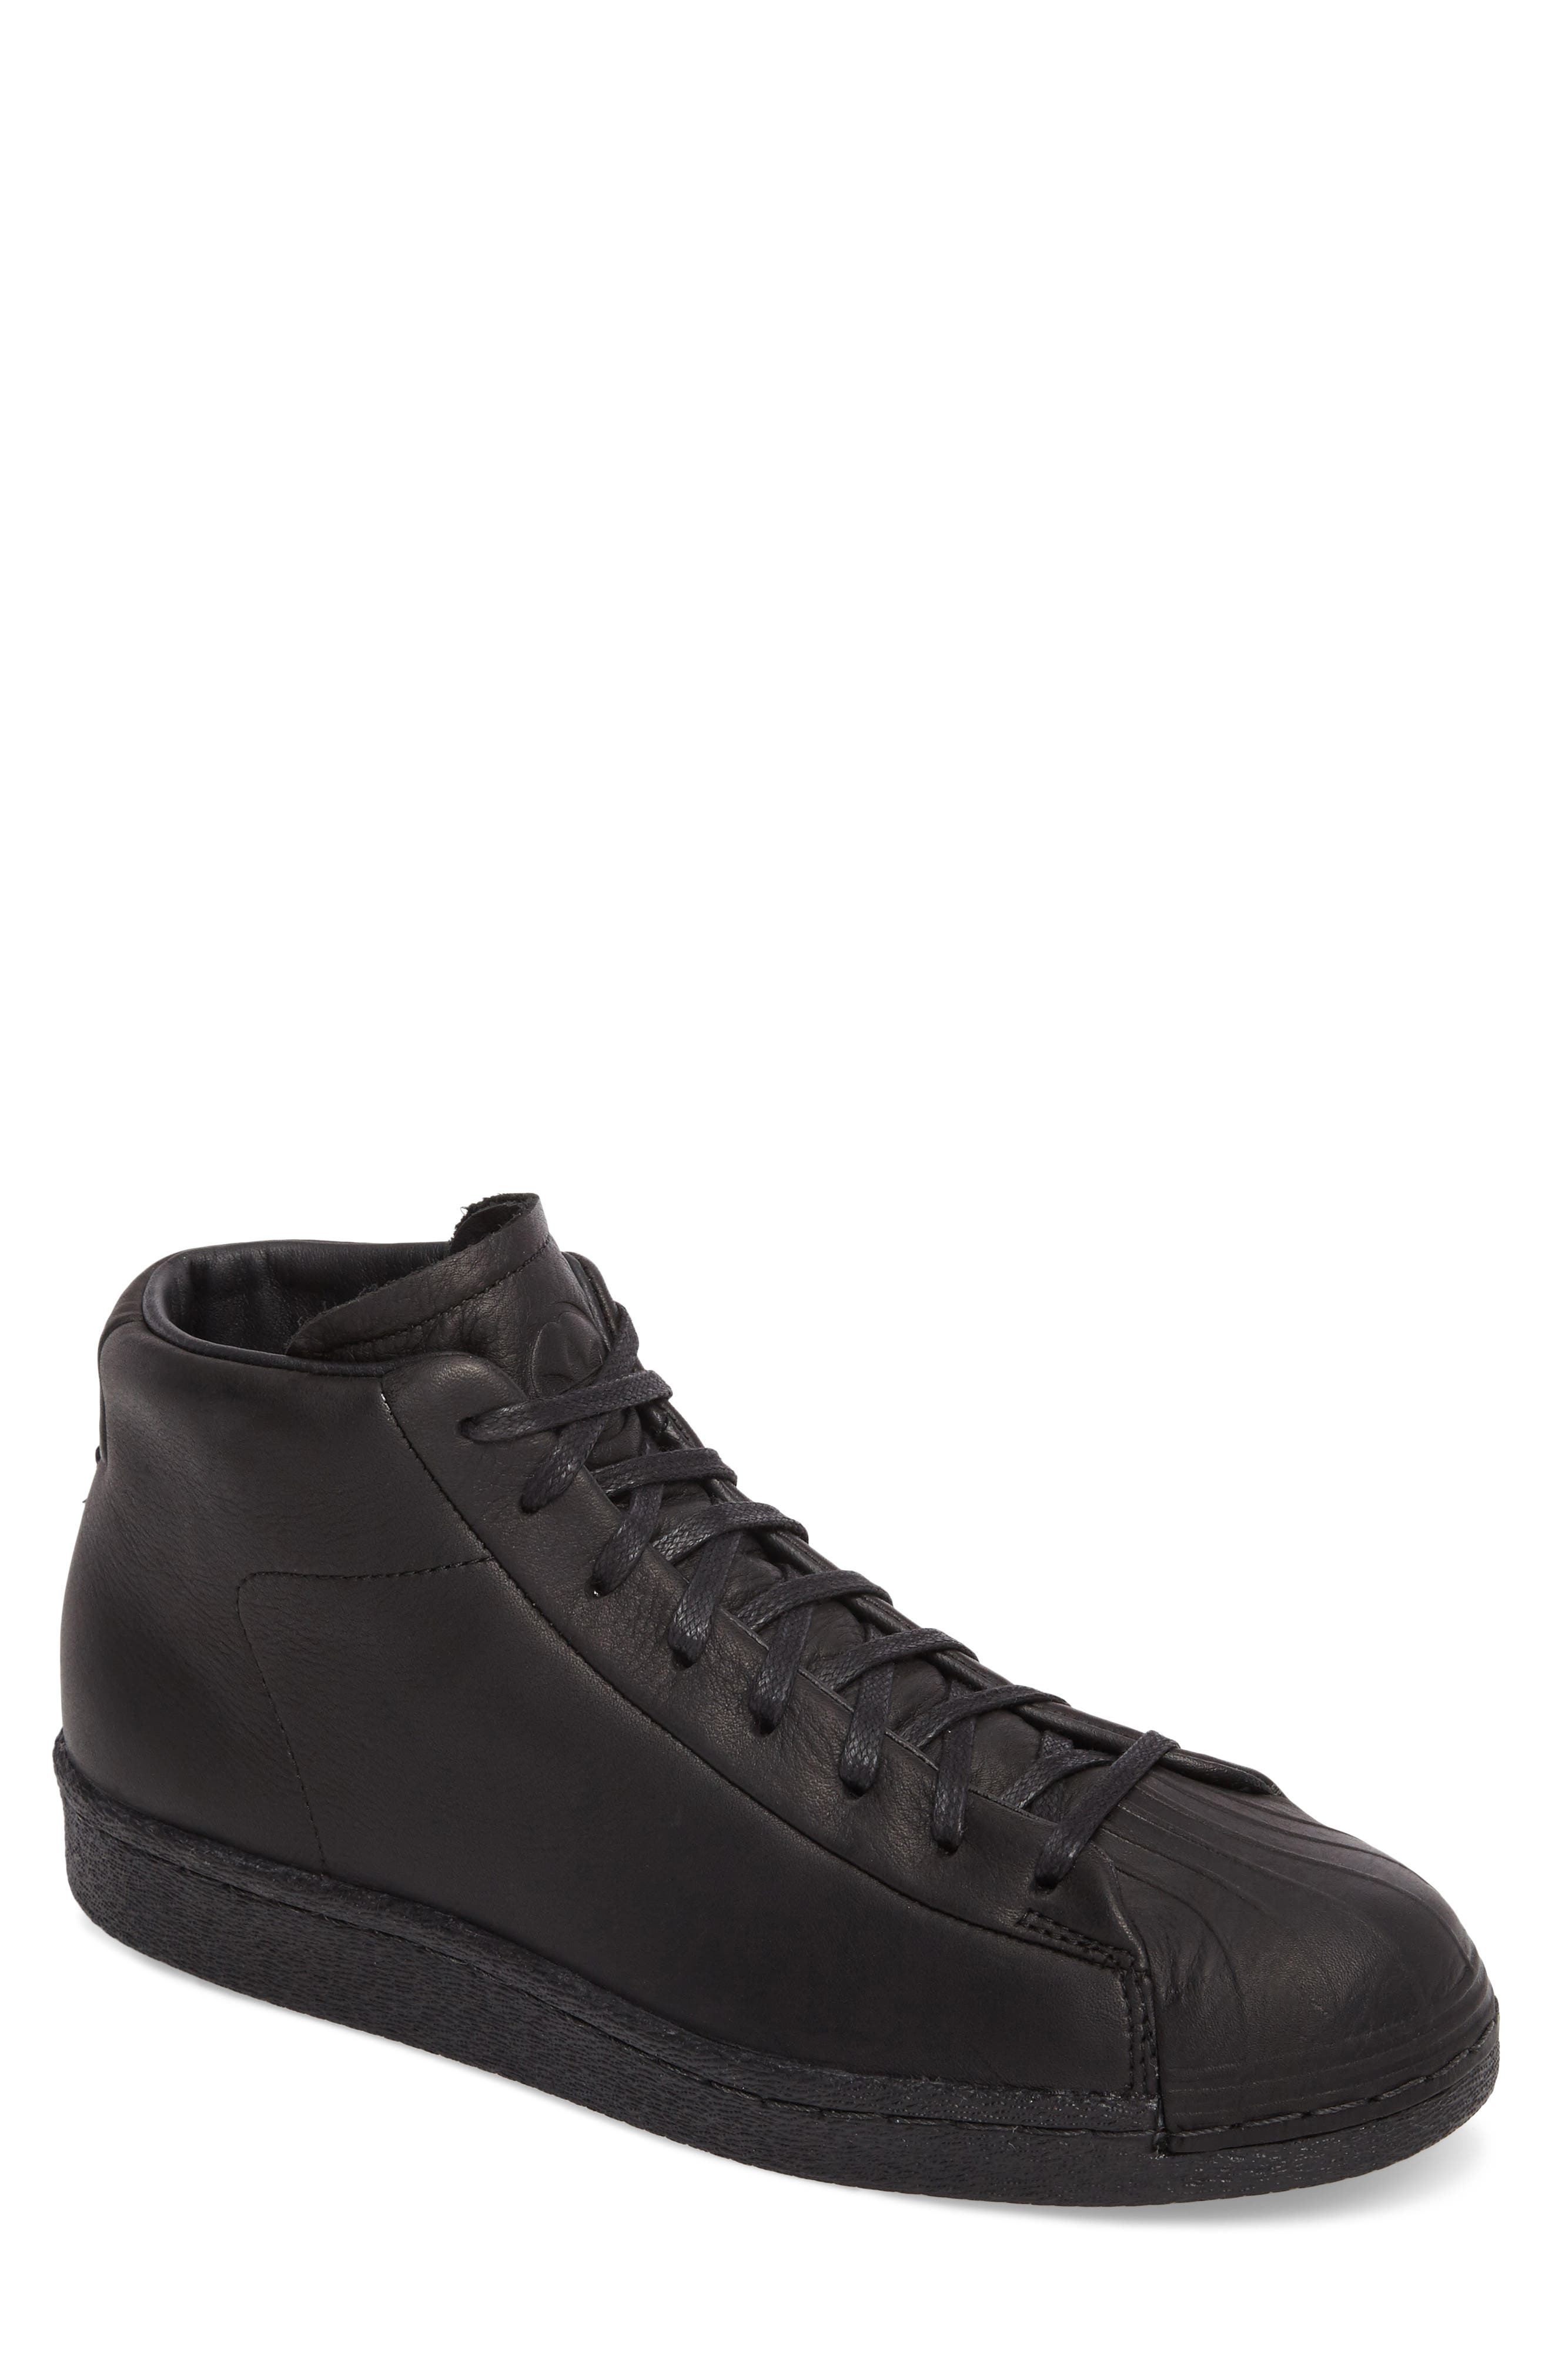 High-Top Sneaker,                             Main thumbnail 1, color,                             001